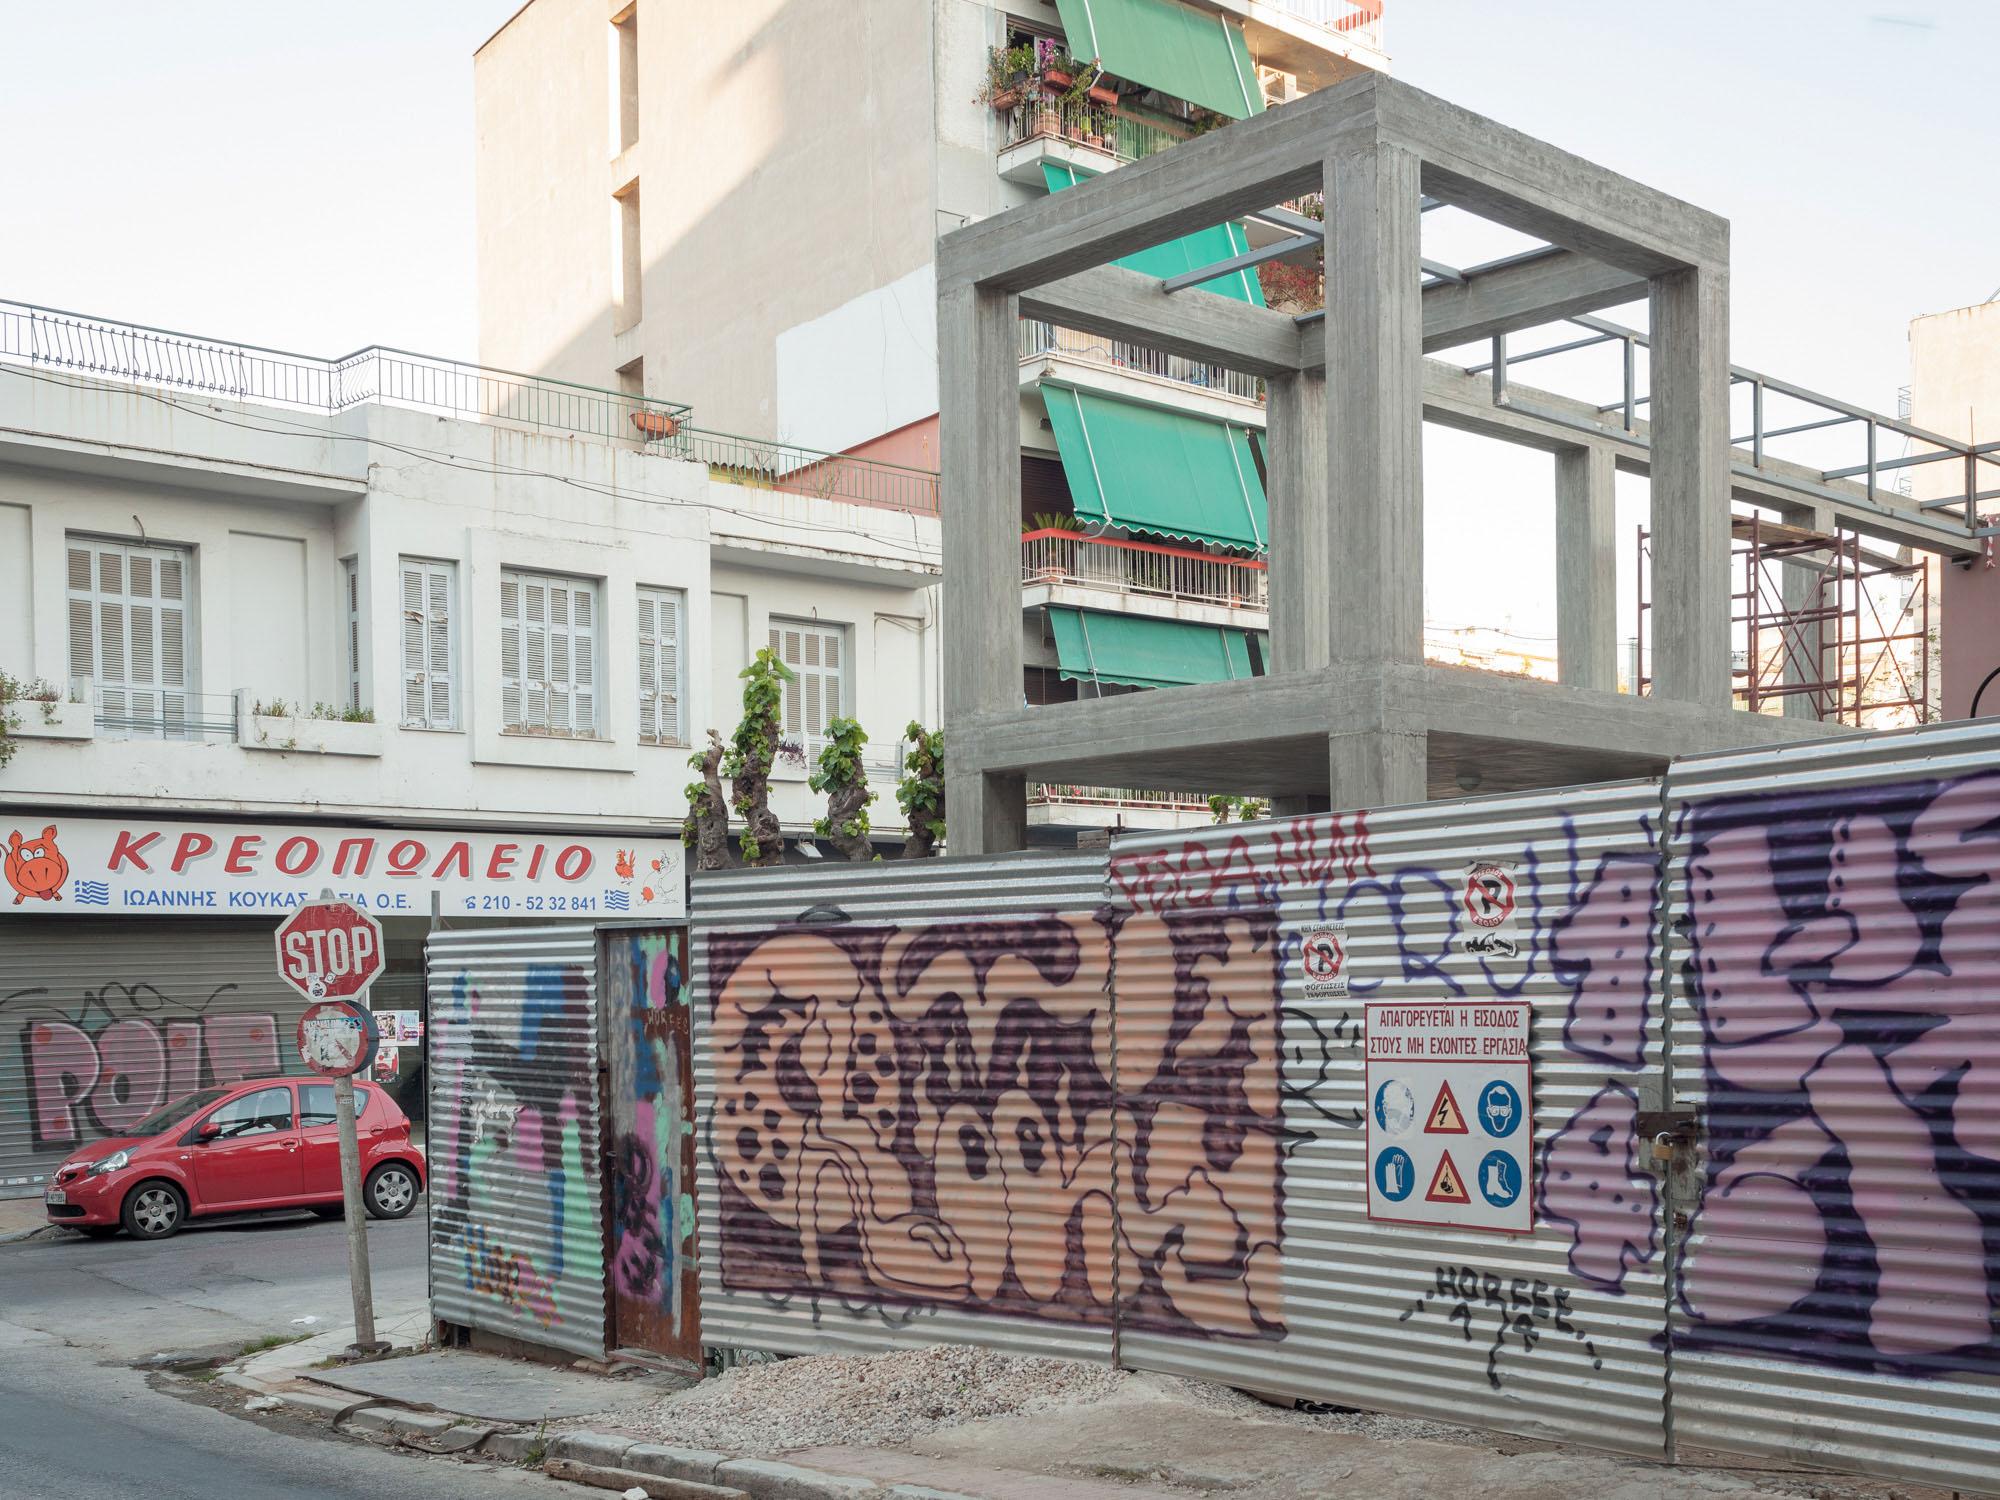 Athen-4087.jpg